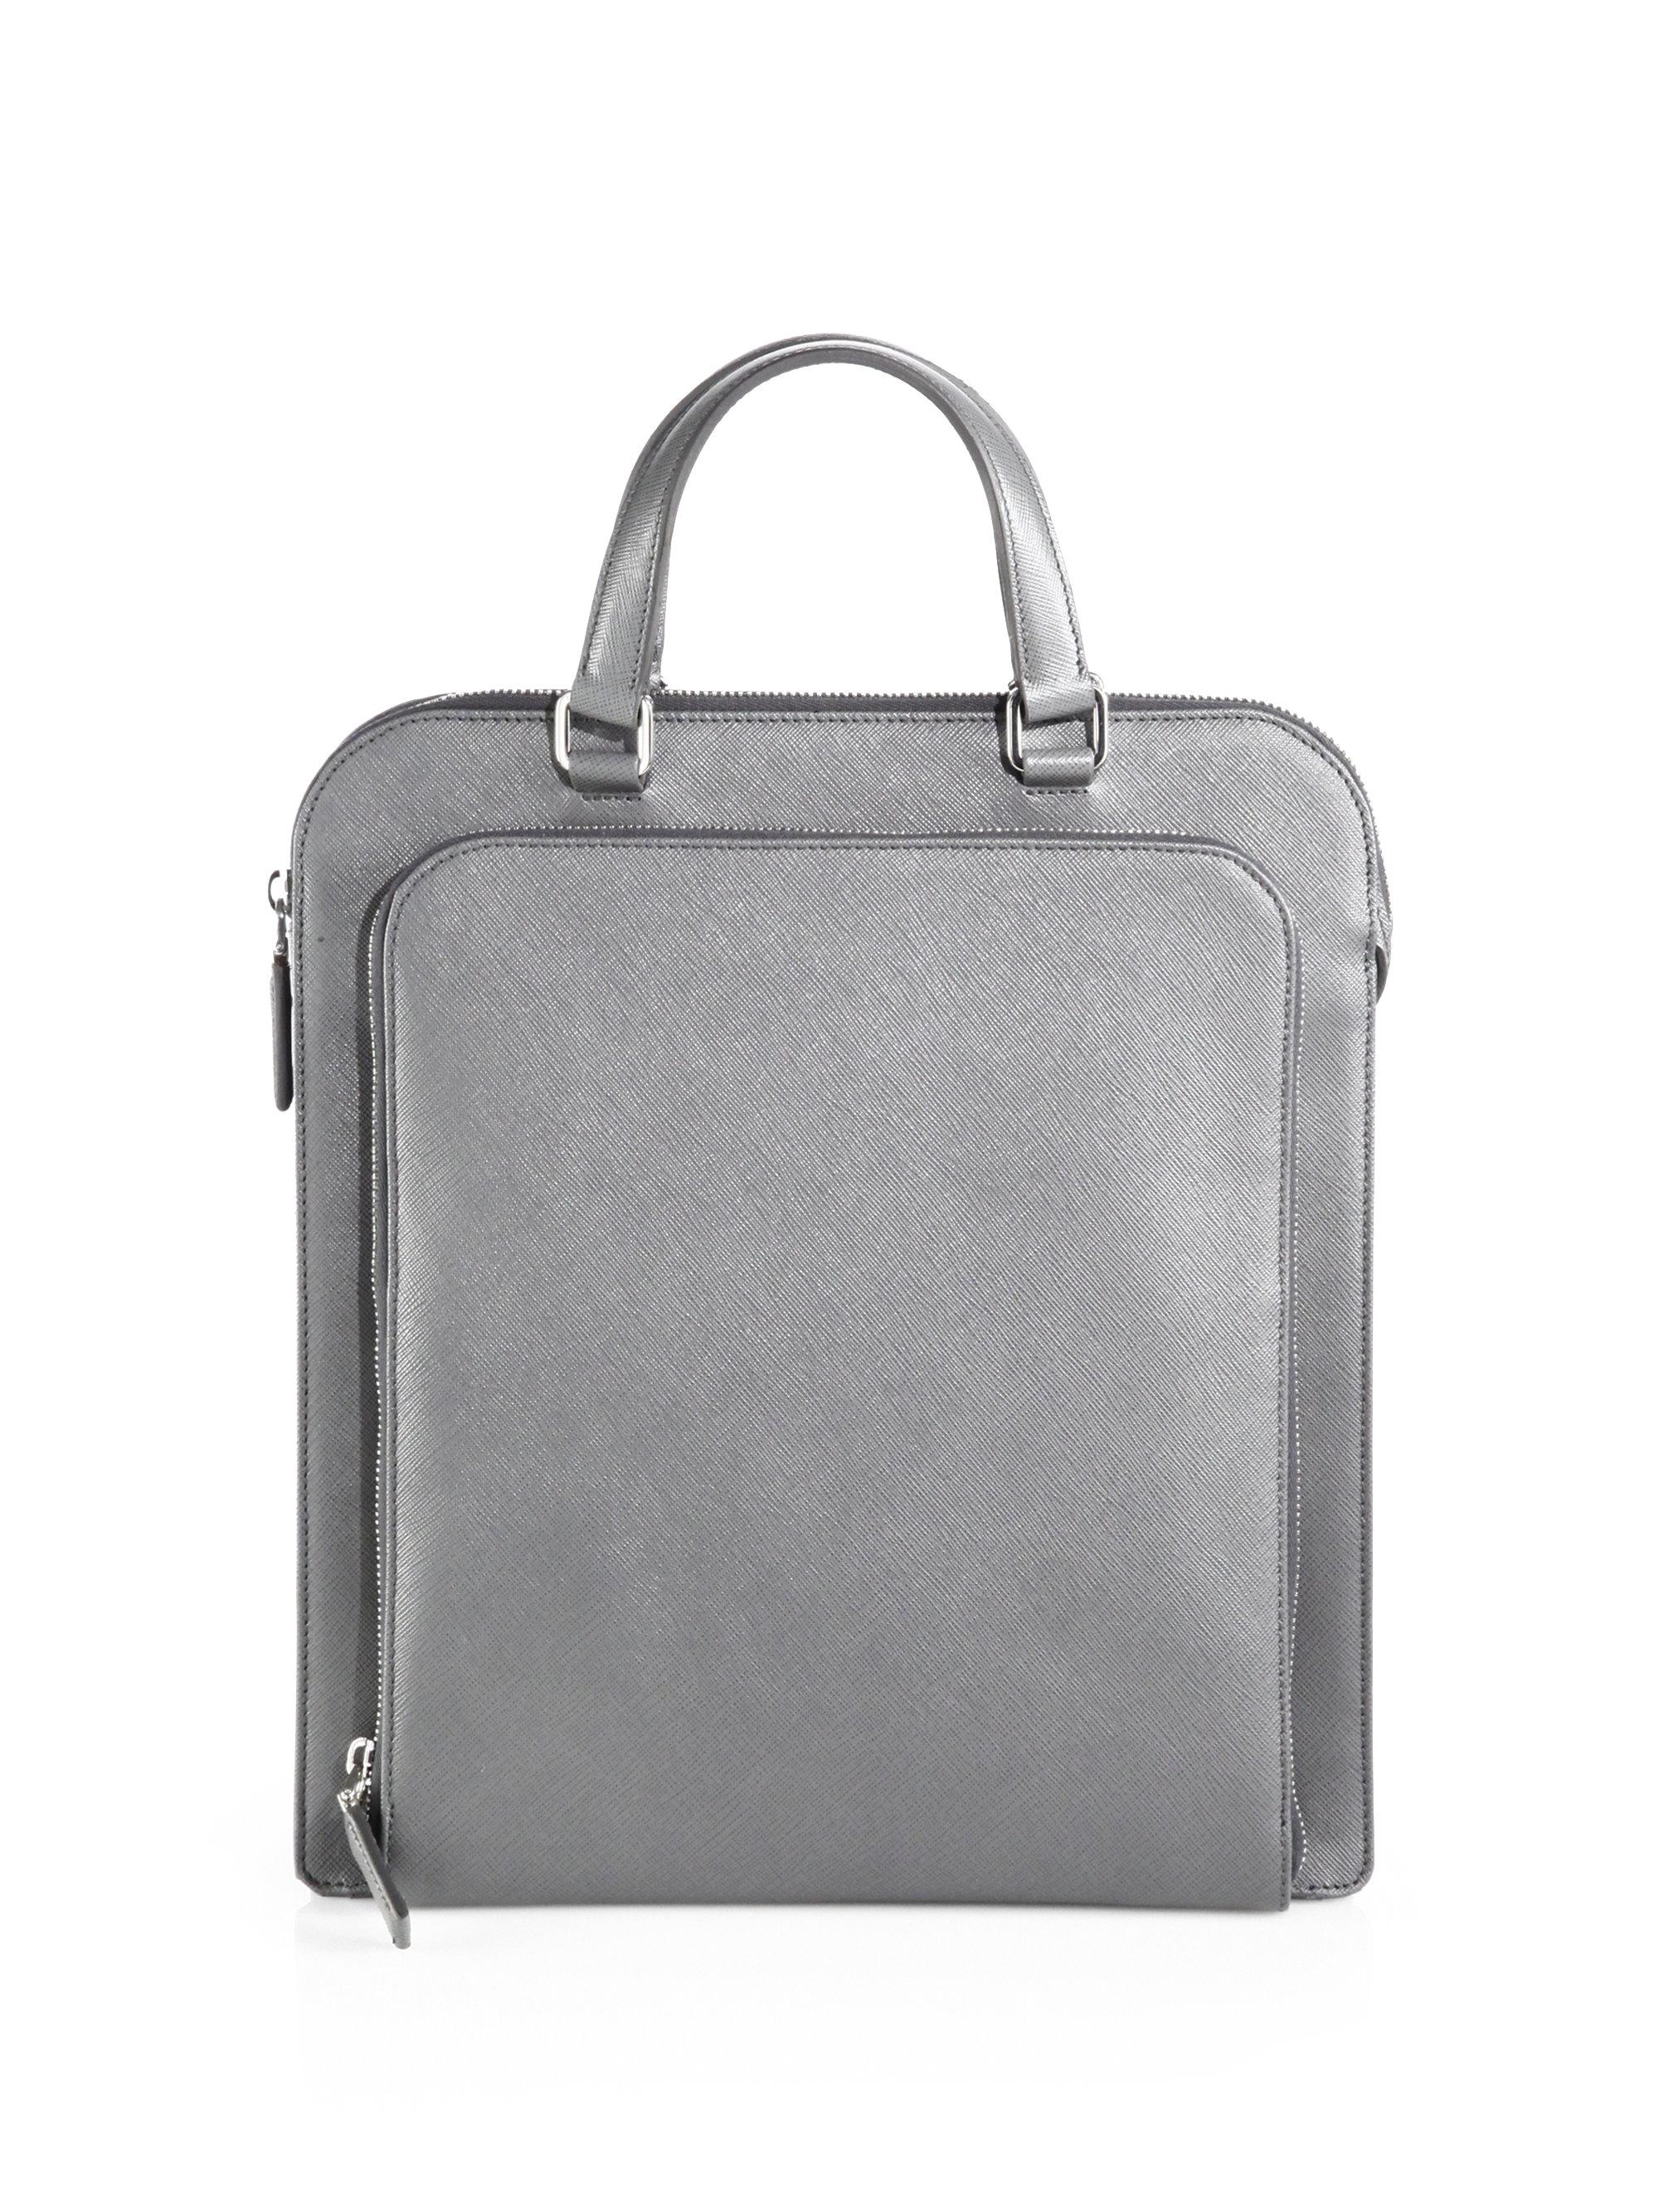 6092eeec9ac5 ... best lyst prada saffiano travel tote in gray for men 9b213 e51c3